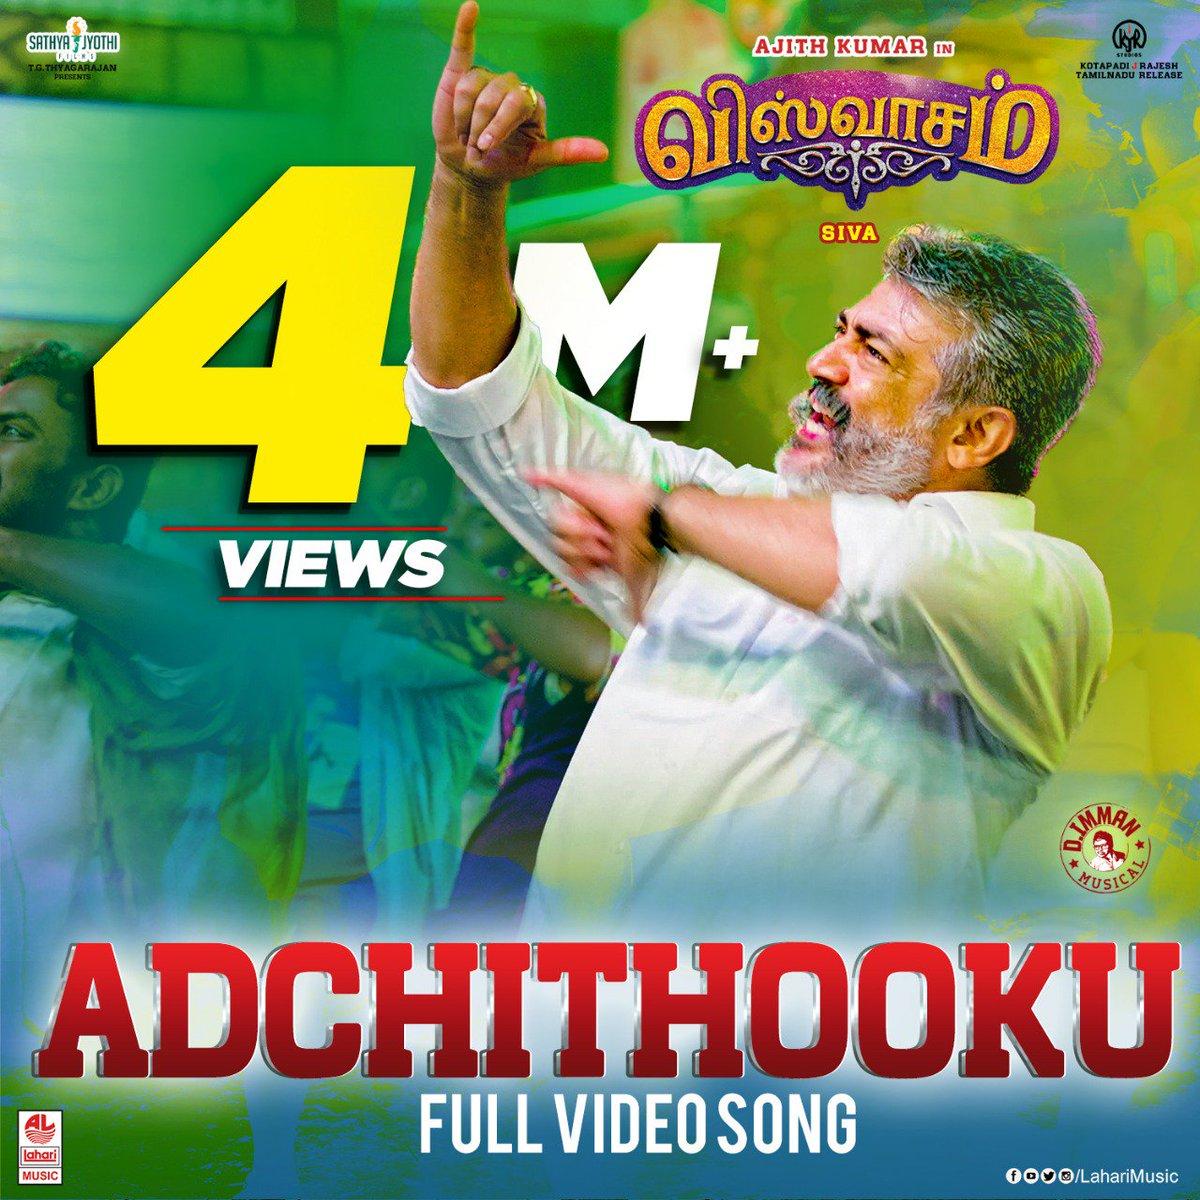 4 Million Views for #Adchithooku Video Song from #Viswasam  - http://youtu.be/mzNbJKKJdSw  💪😎🤟 #AjithKumar #Nayanthara @directorsiva @SathyaJyothi_ @vetrivisuals @immancomposer @dhilipaction @AntonyLRuben @kjr_studios @AandPgroups @DoneChannel1 @LahariMusic #AdchiThookuVideoSong